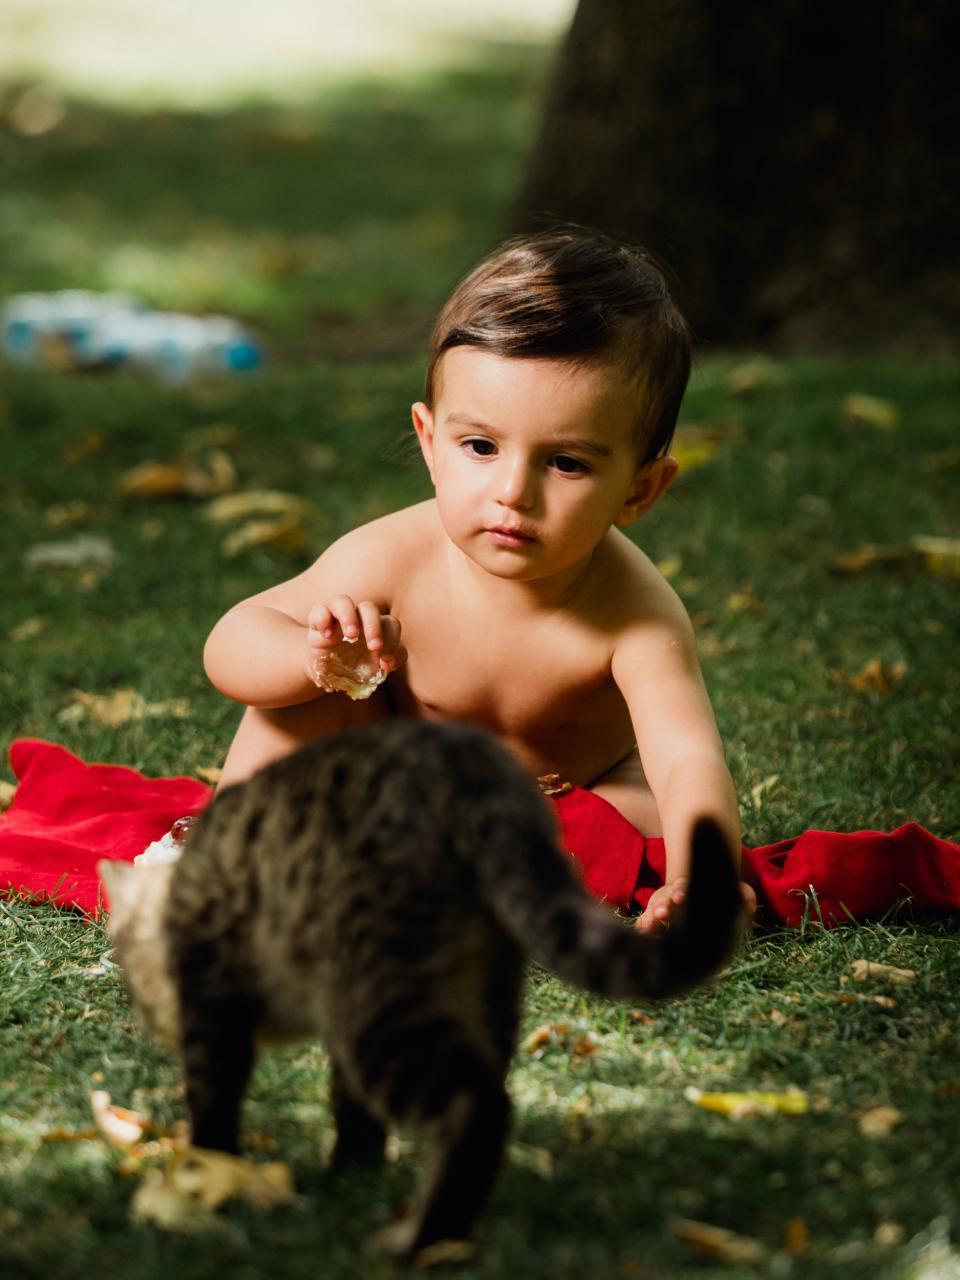 Children-Photography-7.jpg